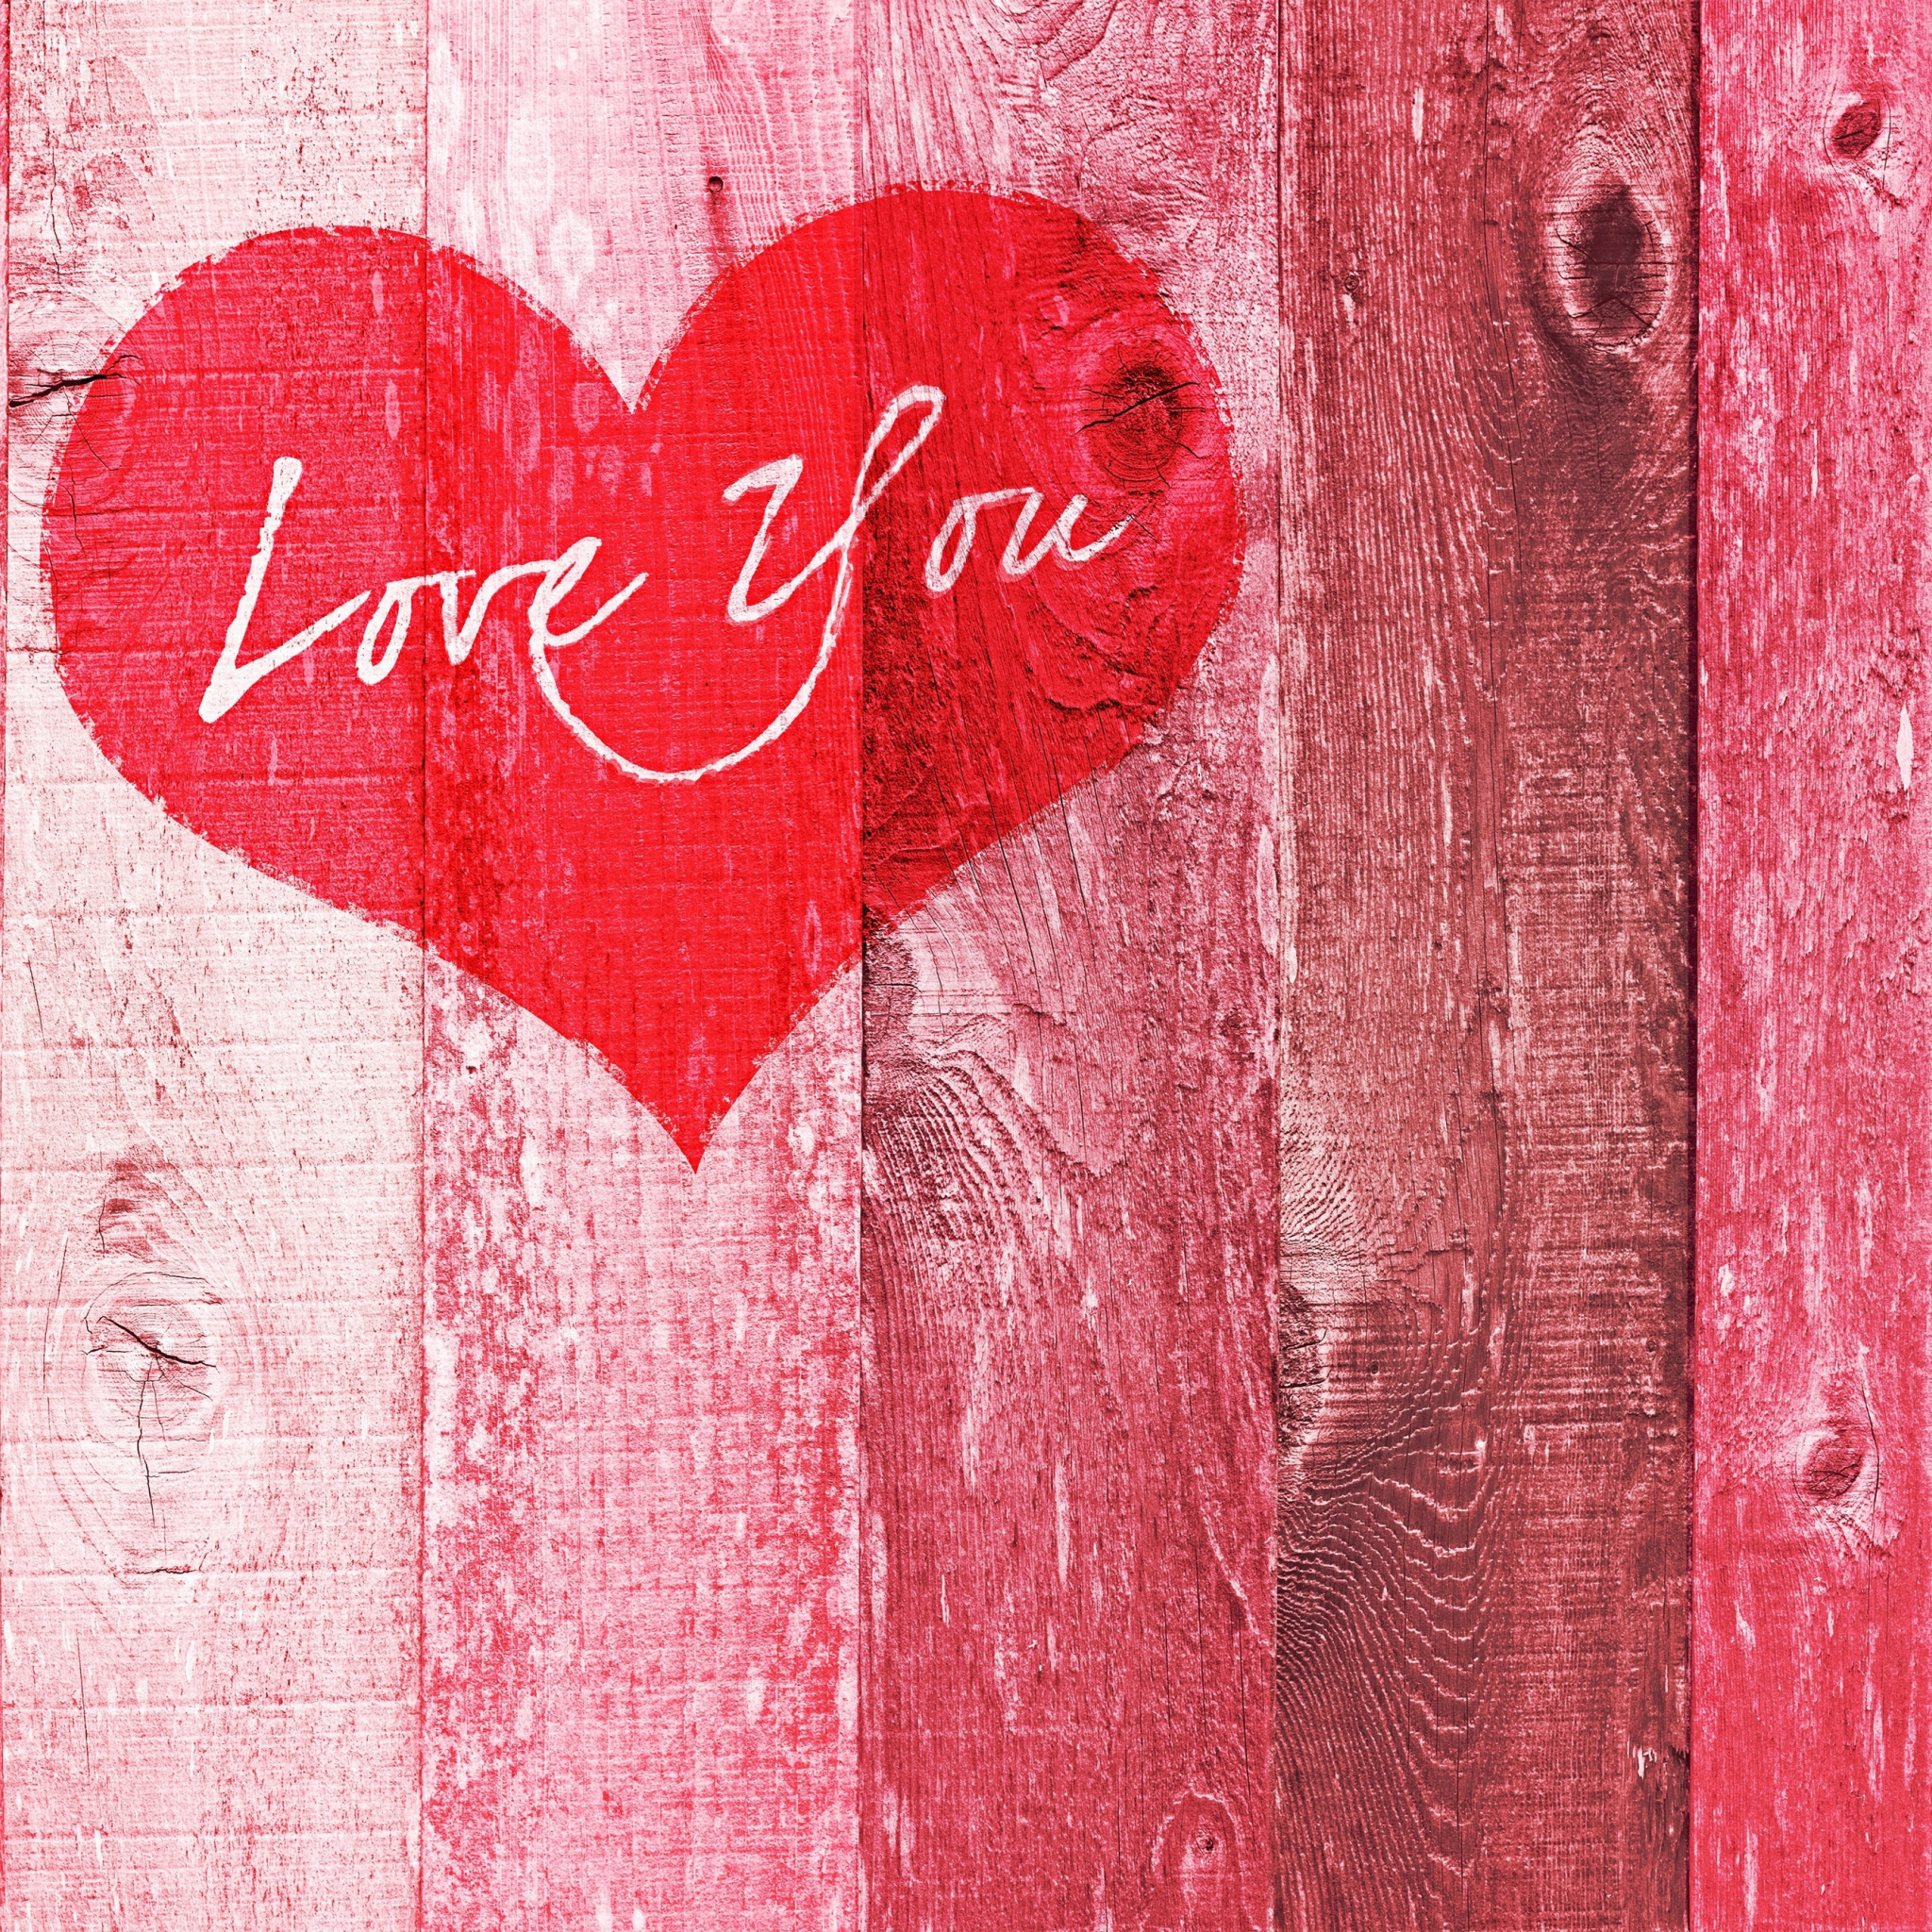 Романтические картинки с надписями на телефон, знаменитостей